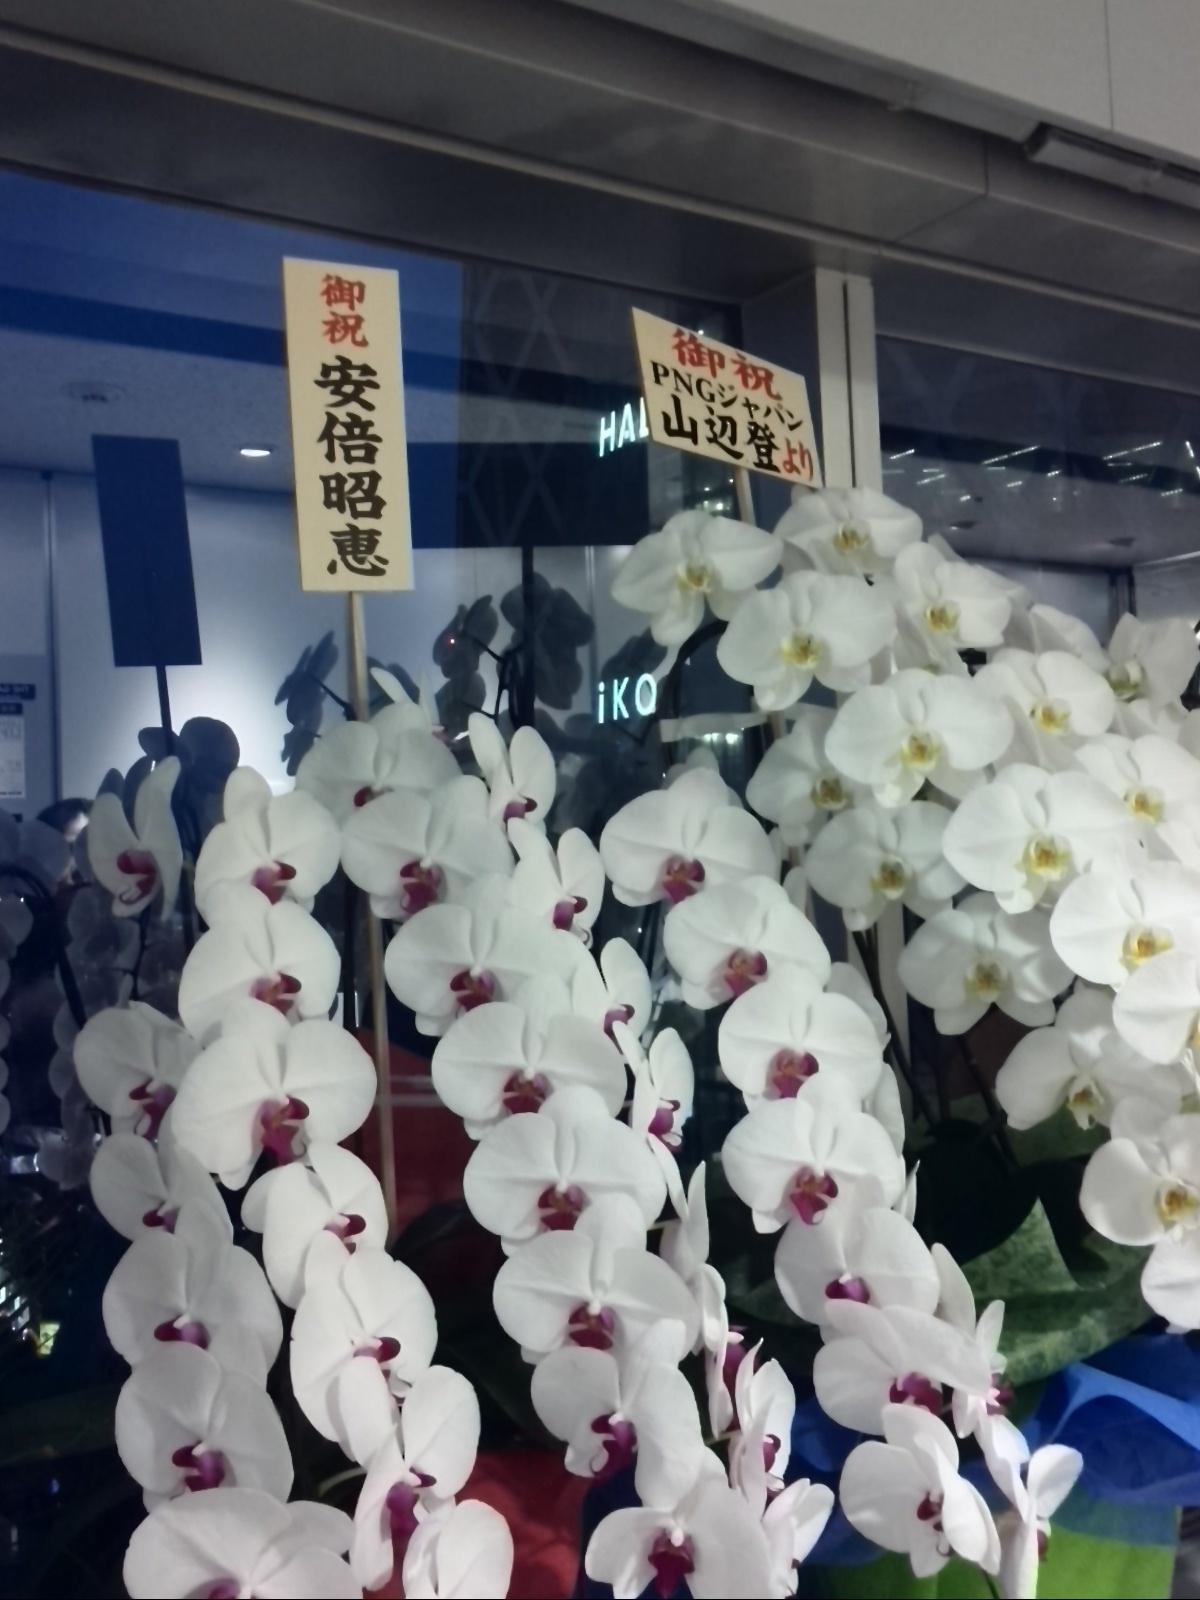 #atelierフォルマーレにてセミナー #高砂淳二写真展 #赤坂おもてなしビアガーデン!_f0340942_23334930.jpg